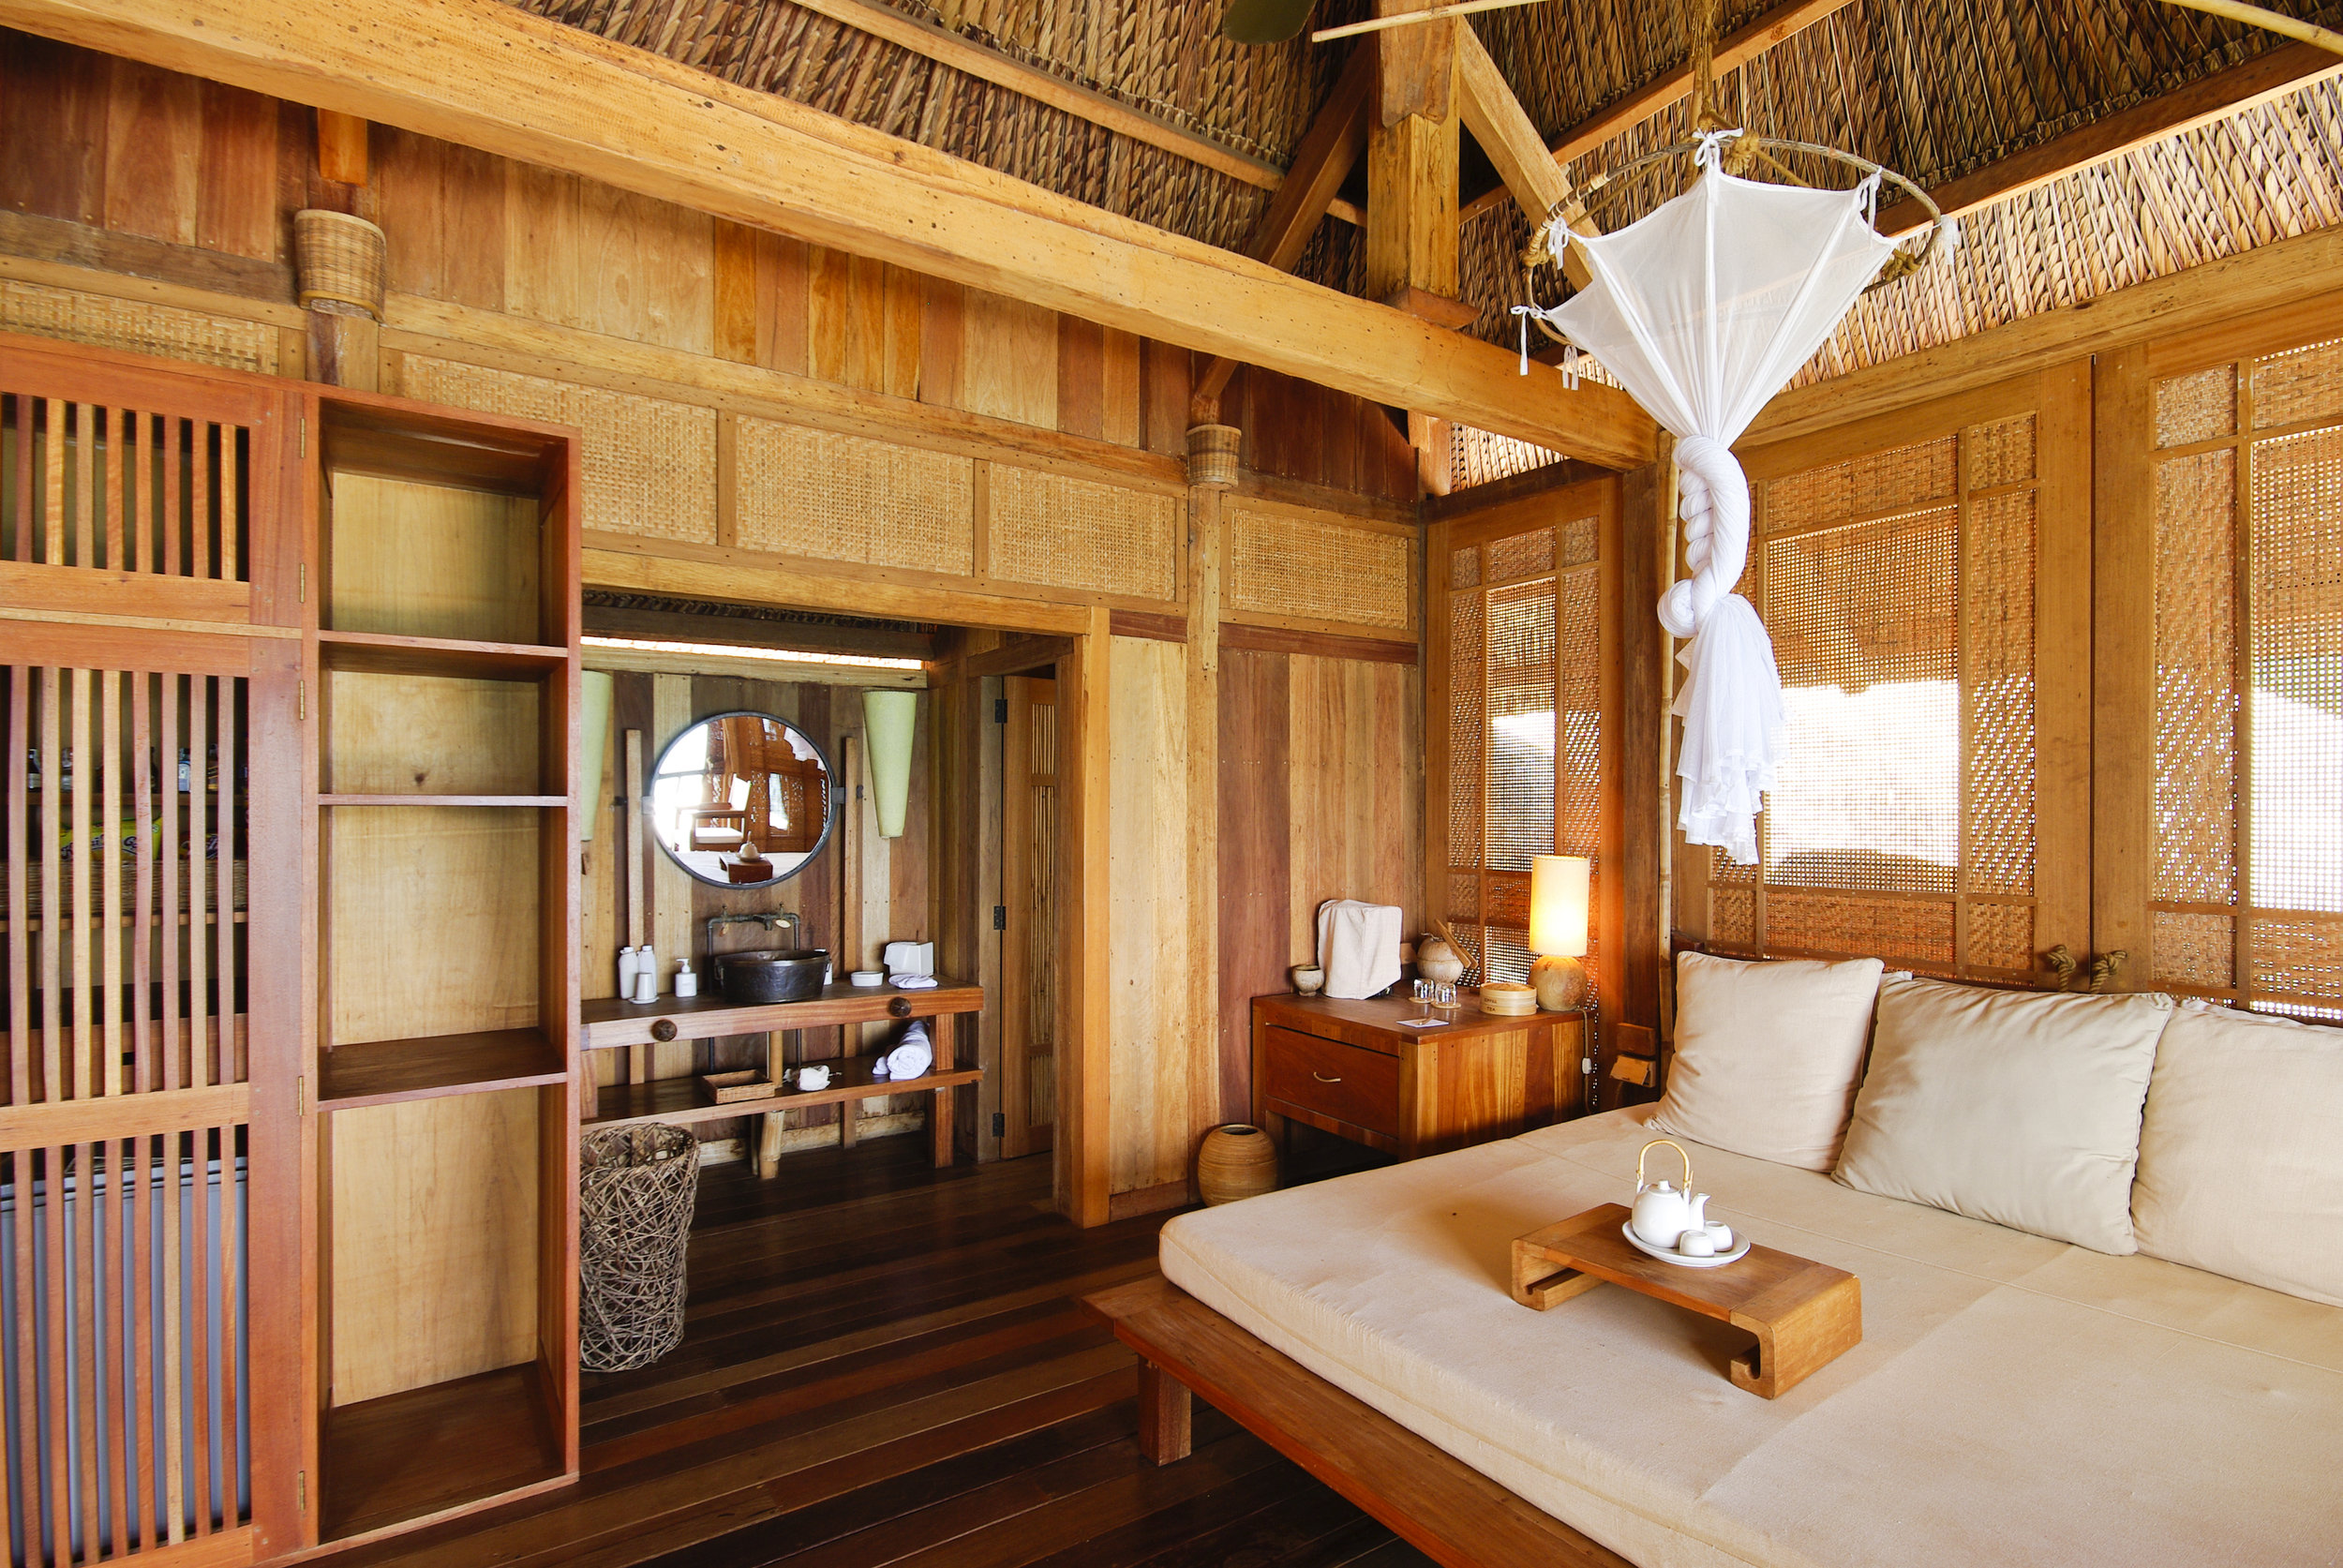 interior-of-a-wooden-house_Svmuee_2Gl.jpg